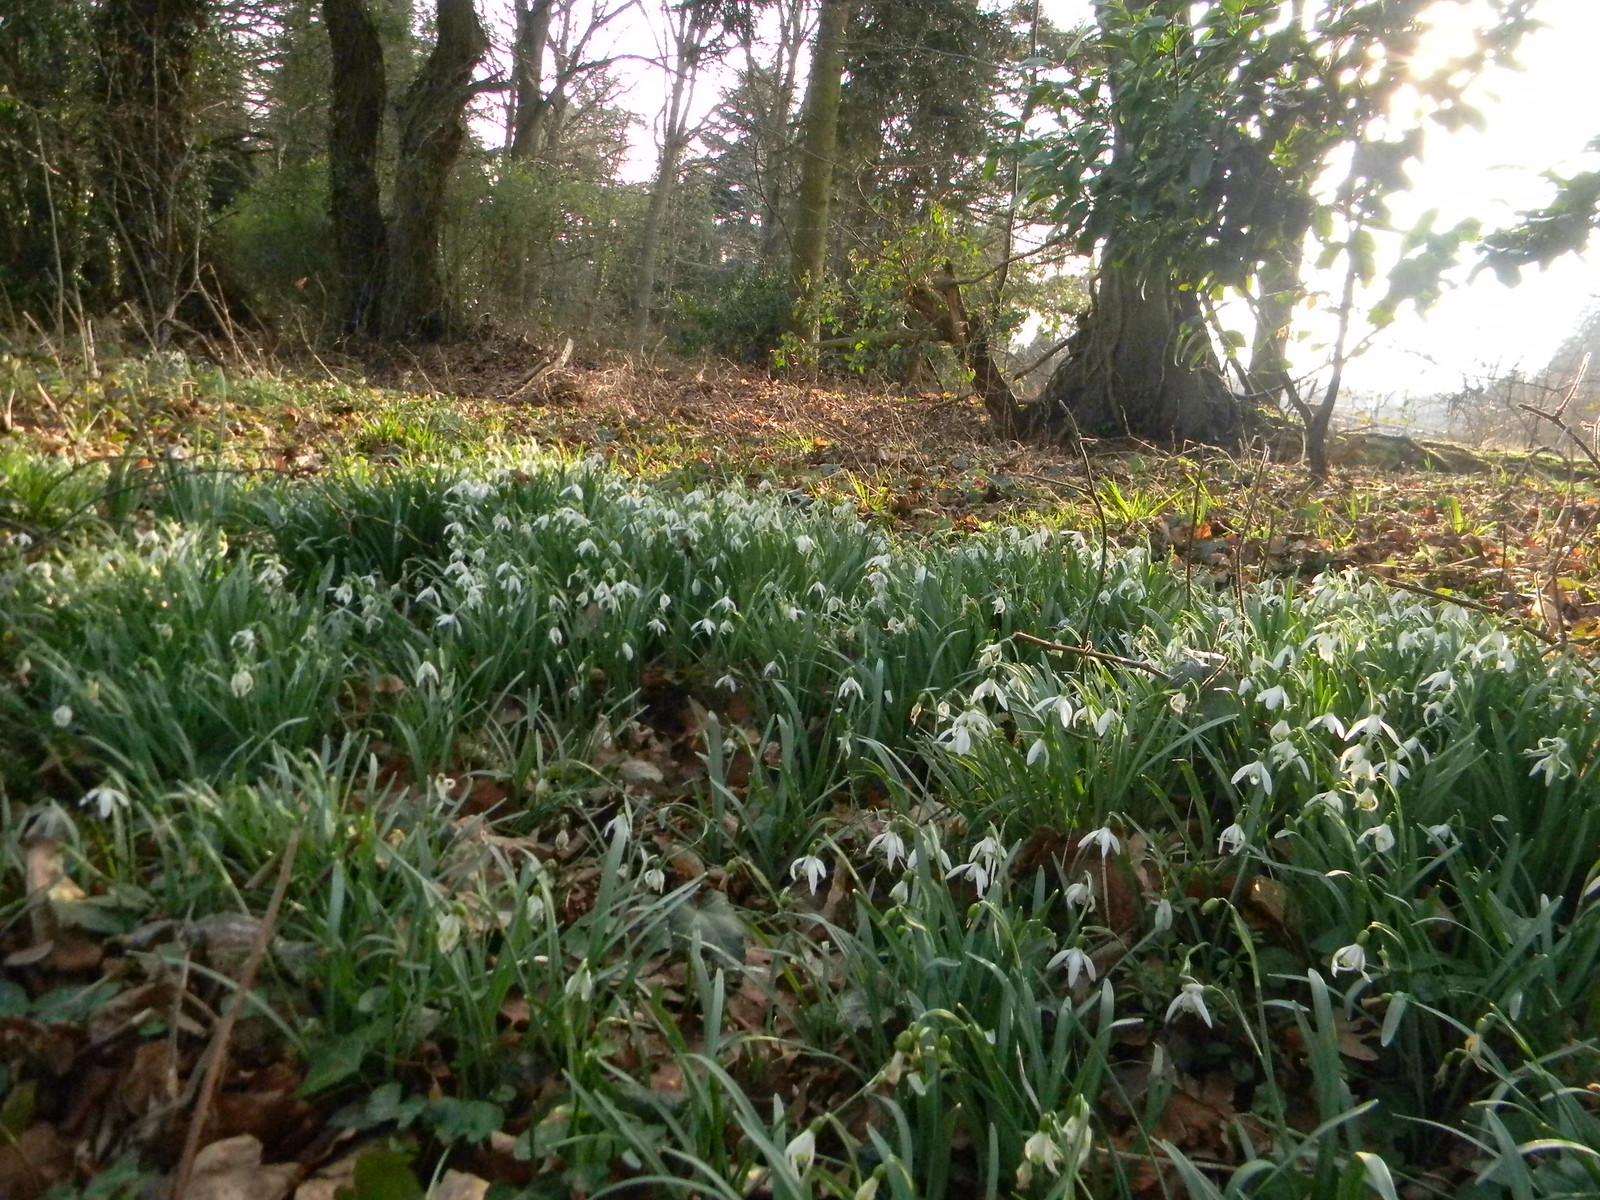 Snowdrops Robertsbridge to Battle